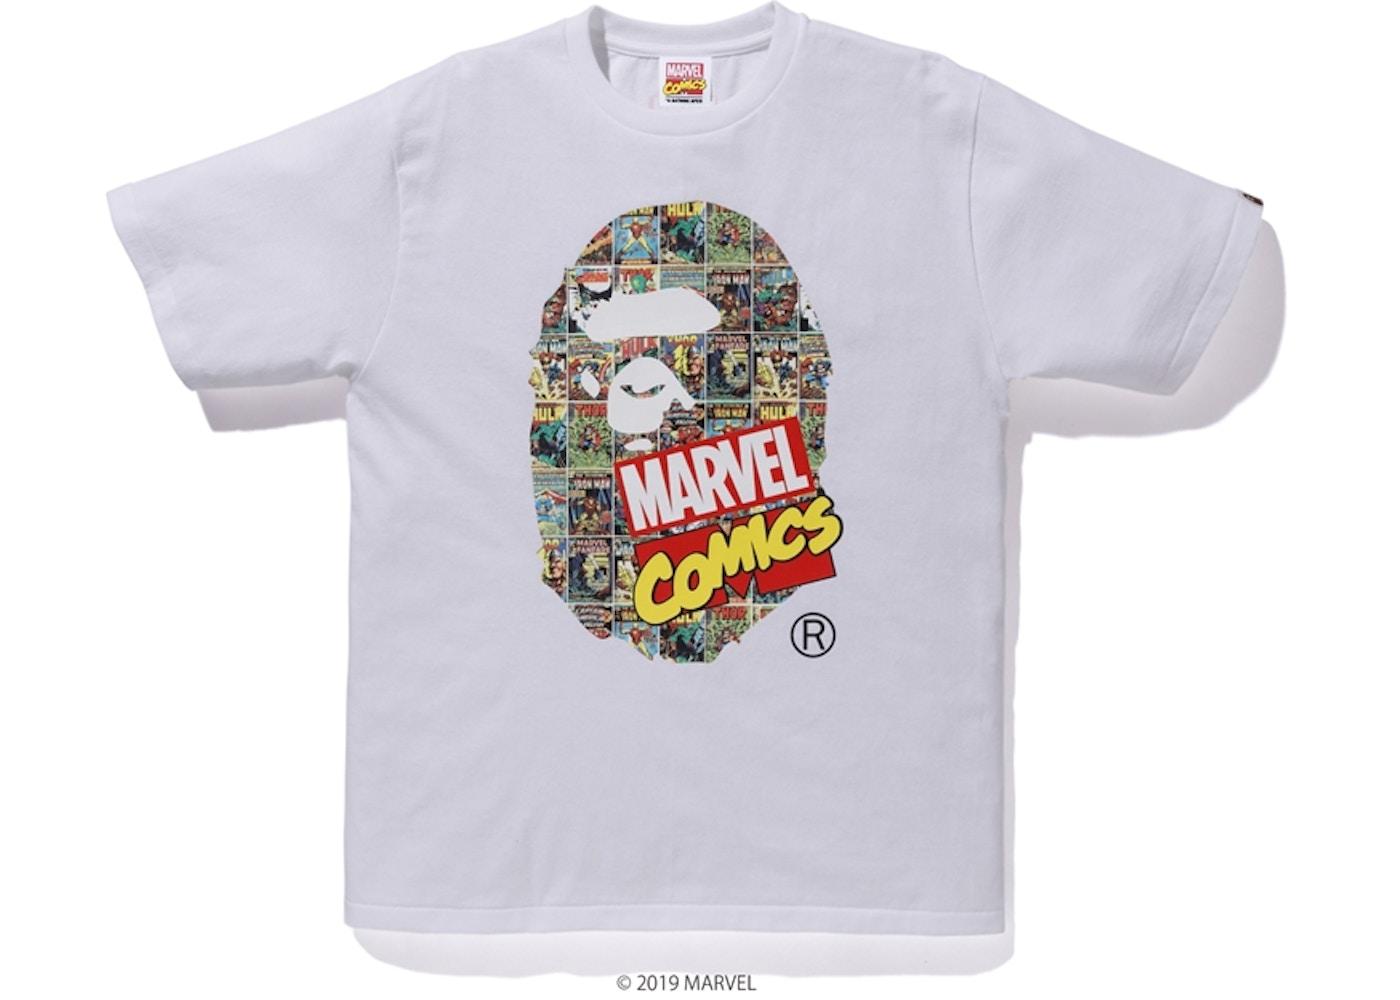 3c0e9ab6eac6 Bape T-Shirts - Buy   Sell Streetwear